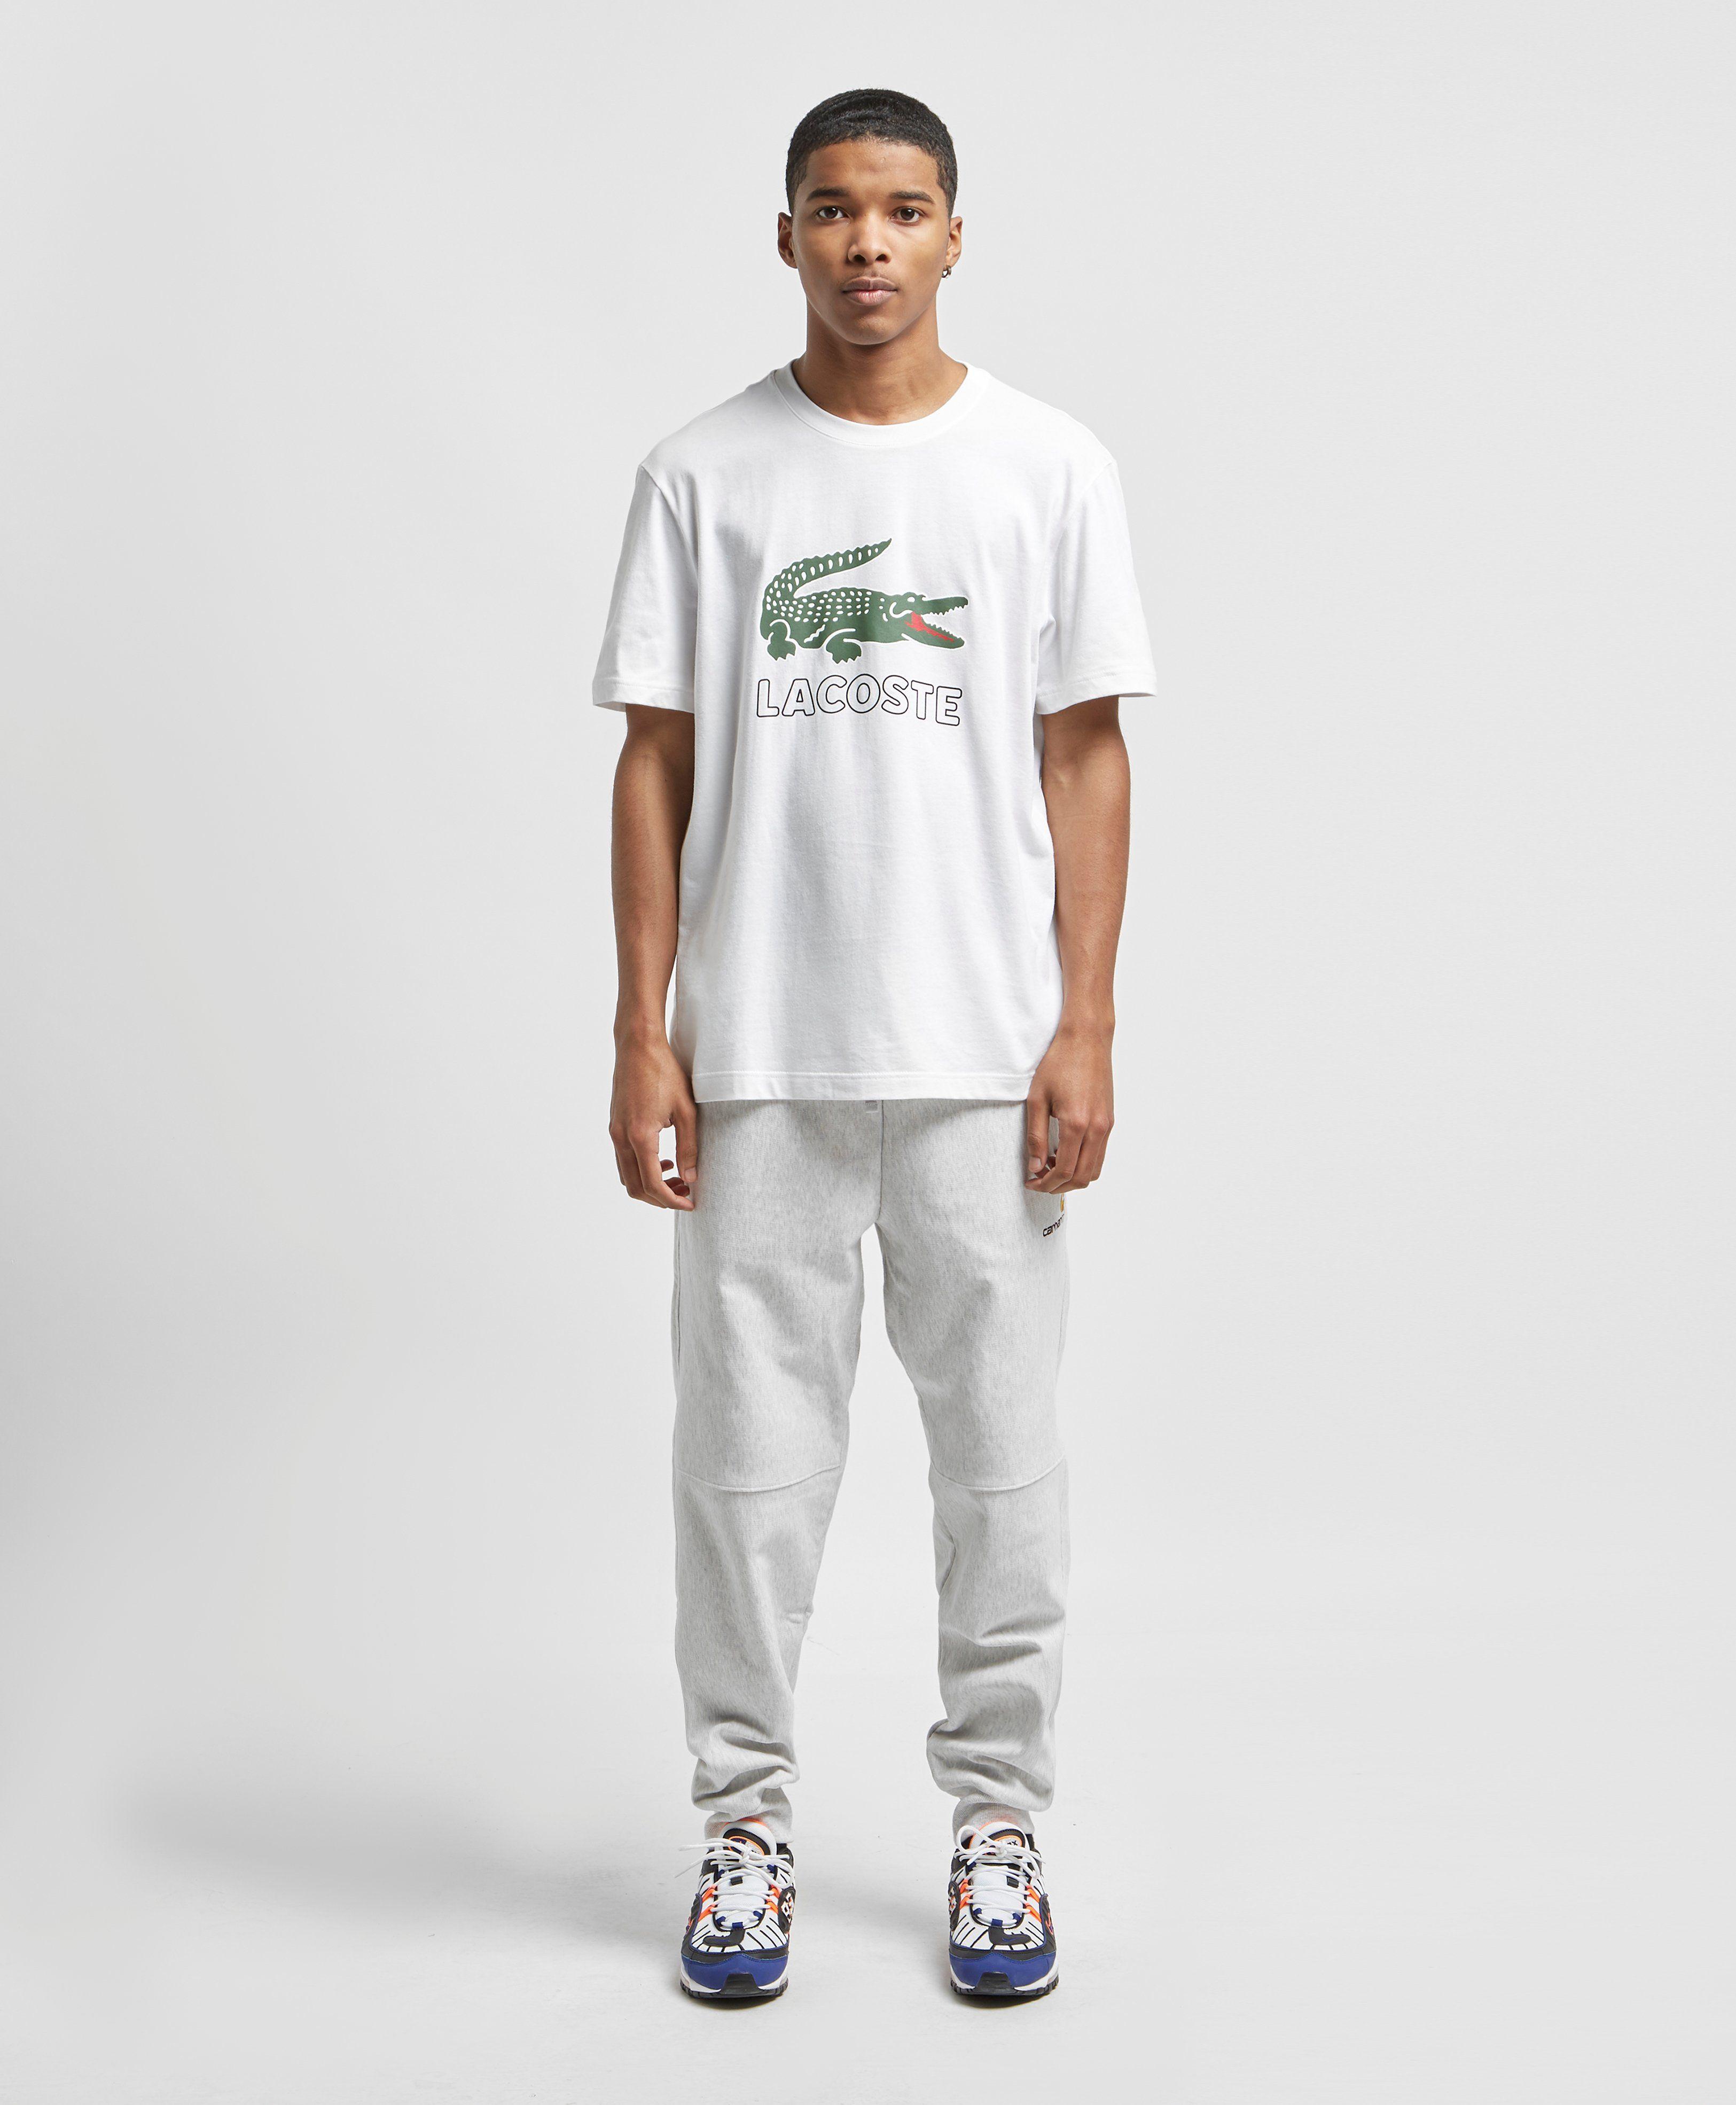 Lacoste Large Crocodile Logo Vintage T-Shirt